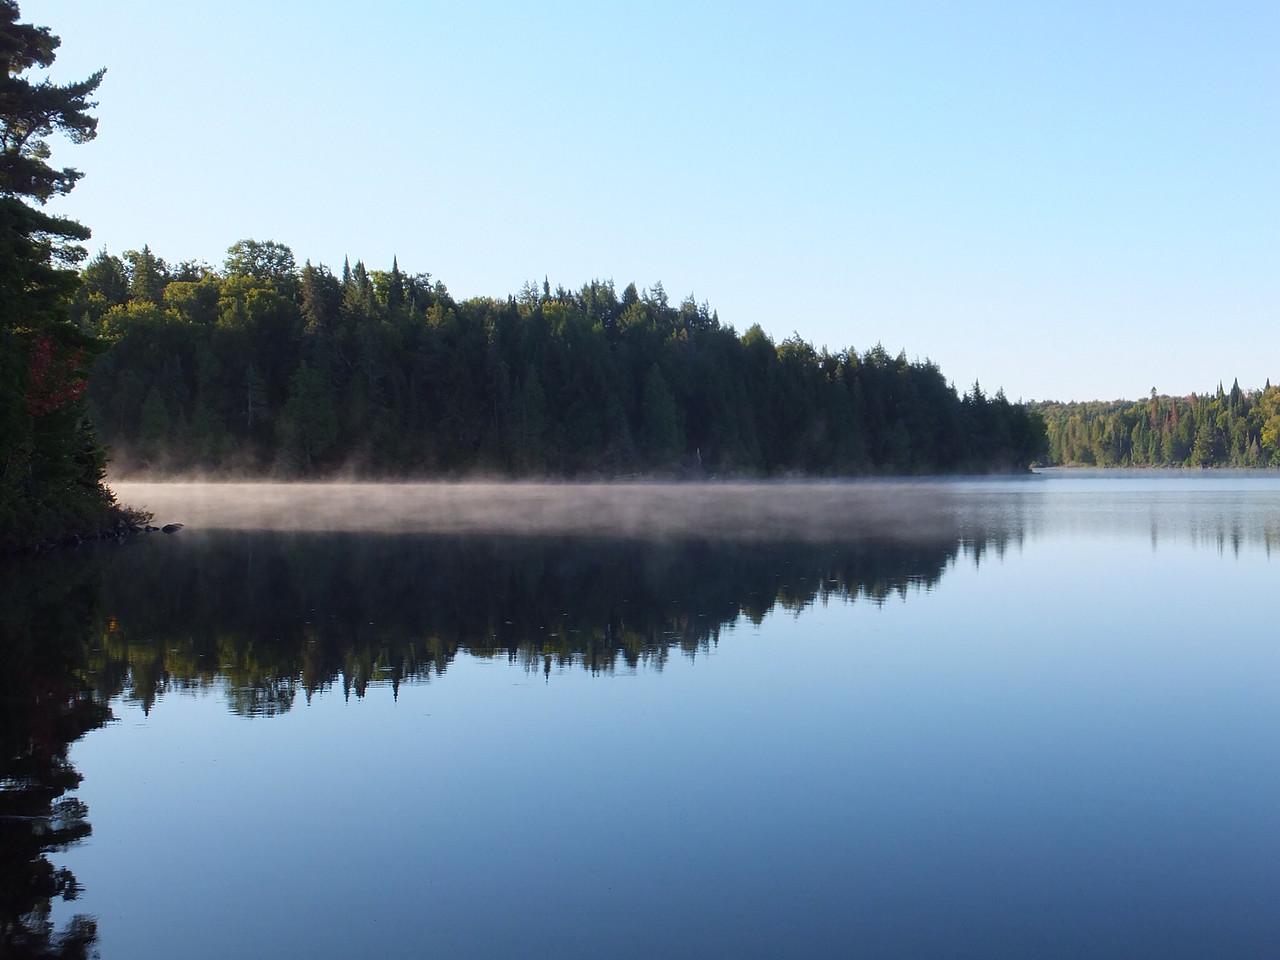 Morning mist on Timberwolf